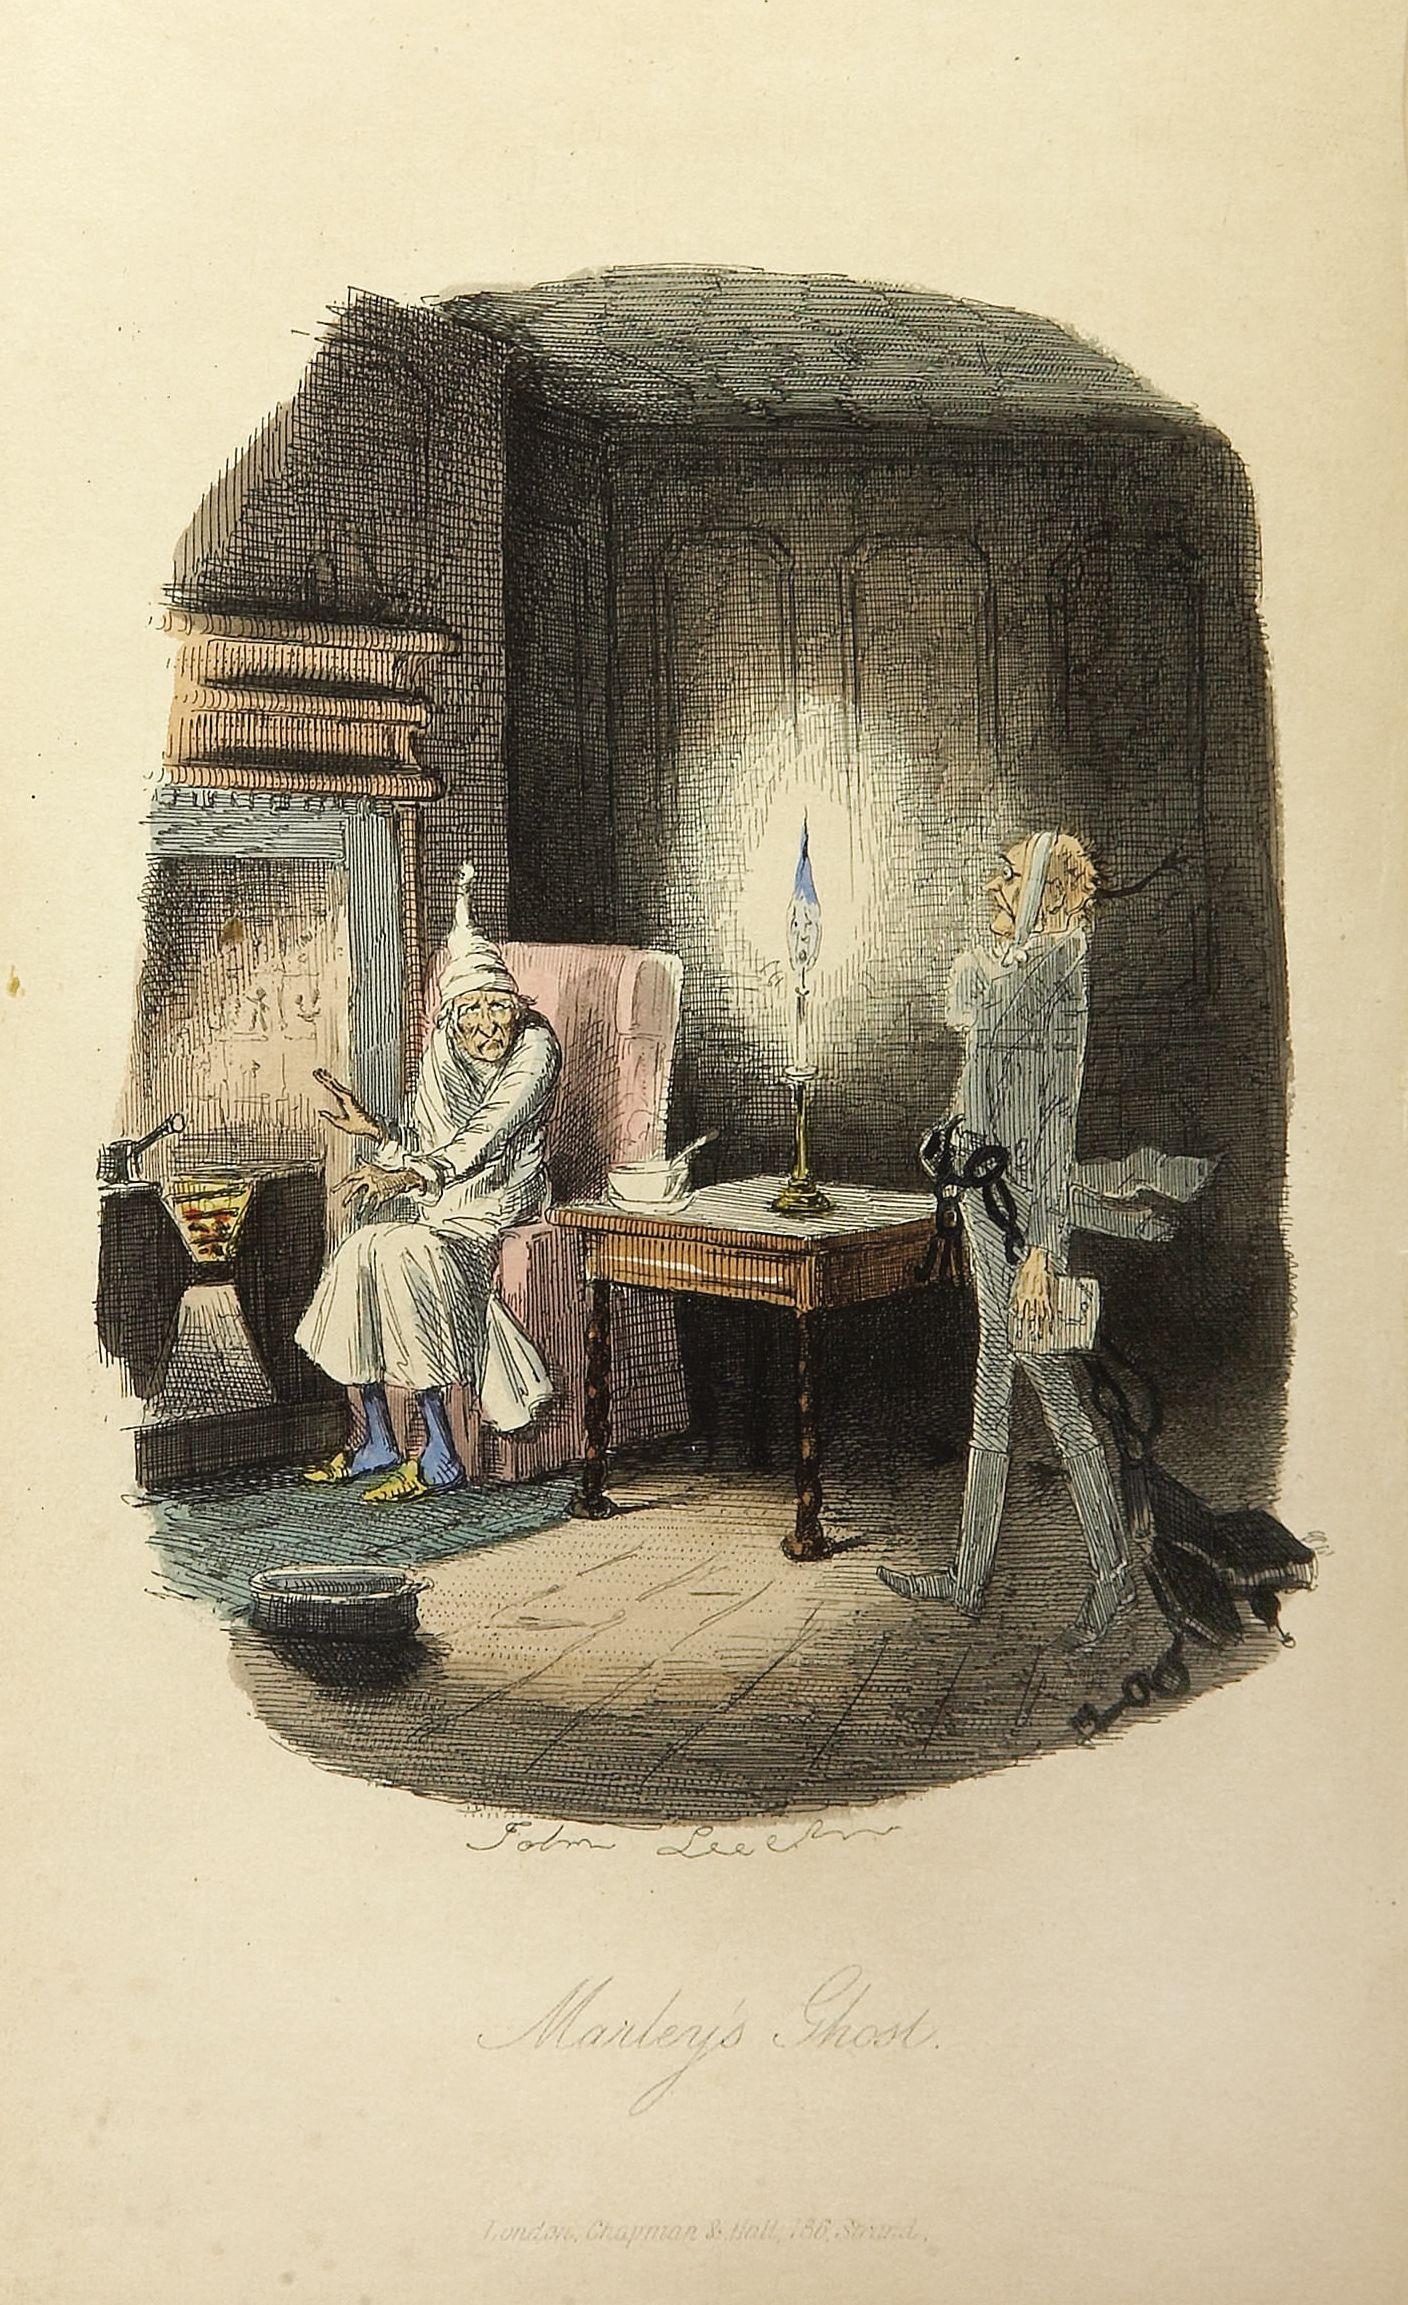 Ebenezer Scrooge - Wikipedia